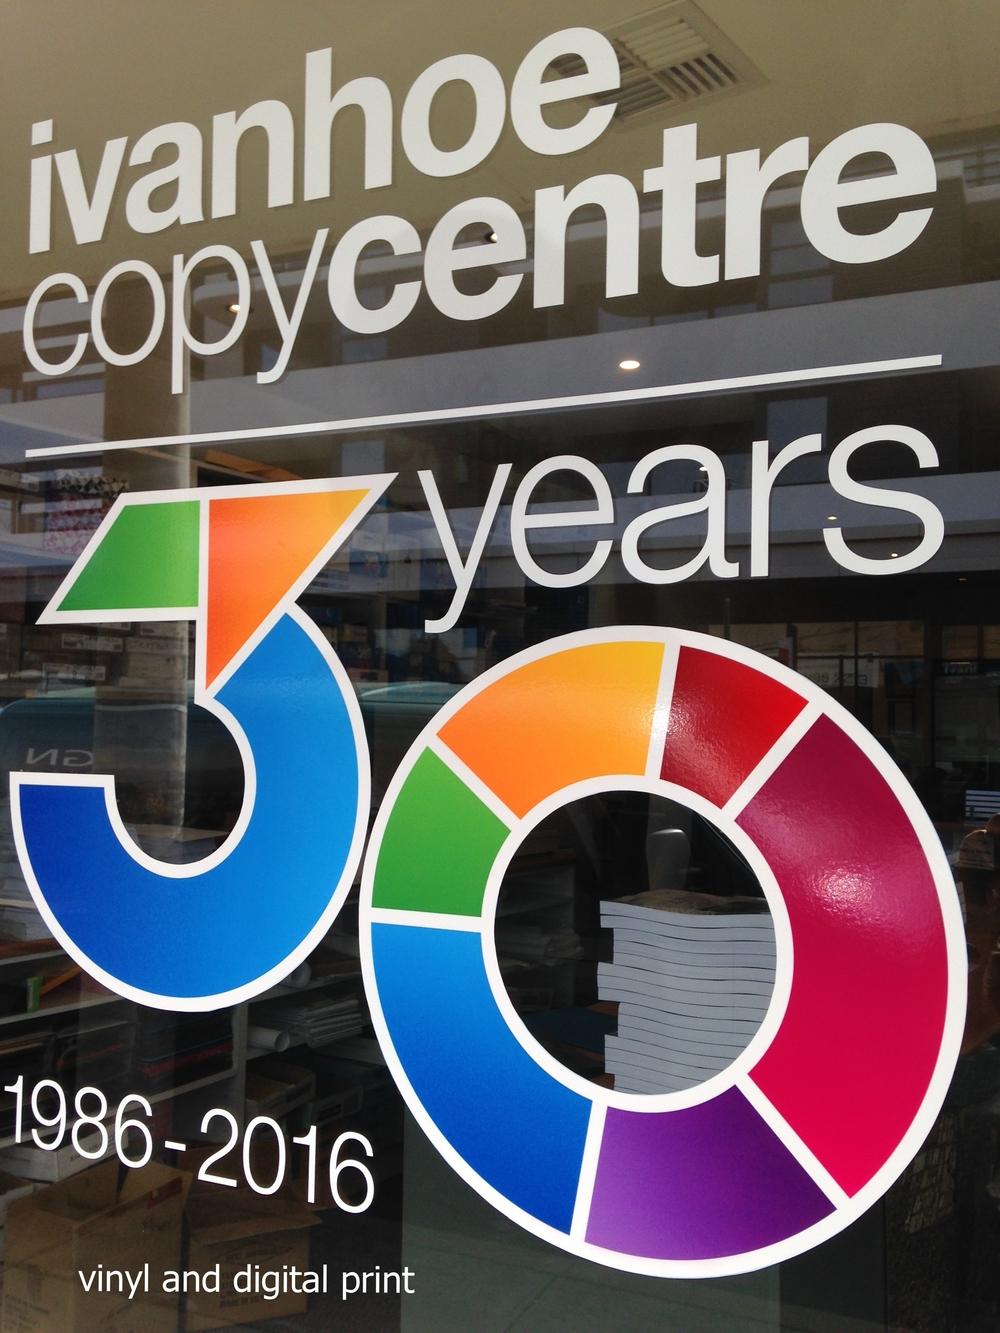 copy centre.JPG